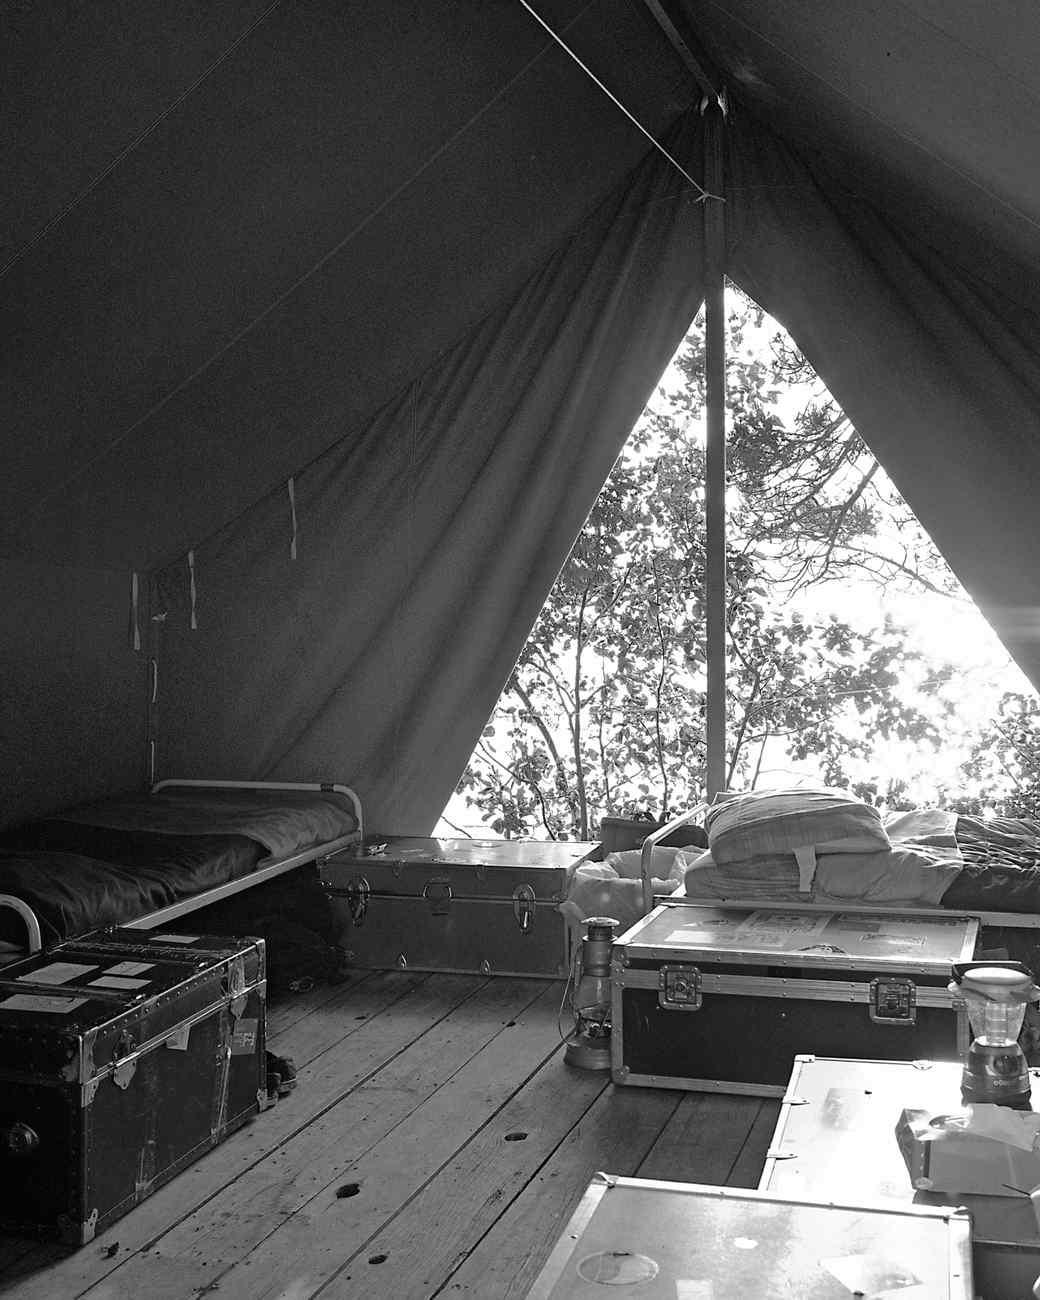 pine-island-summer-camp-ms108559-195.jpg